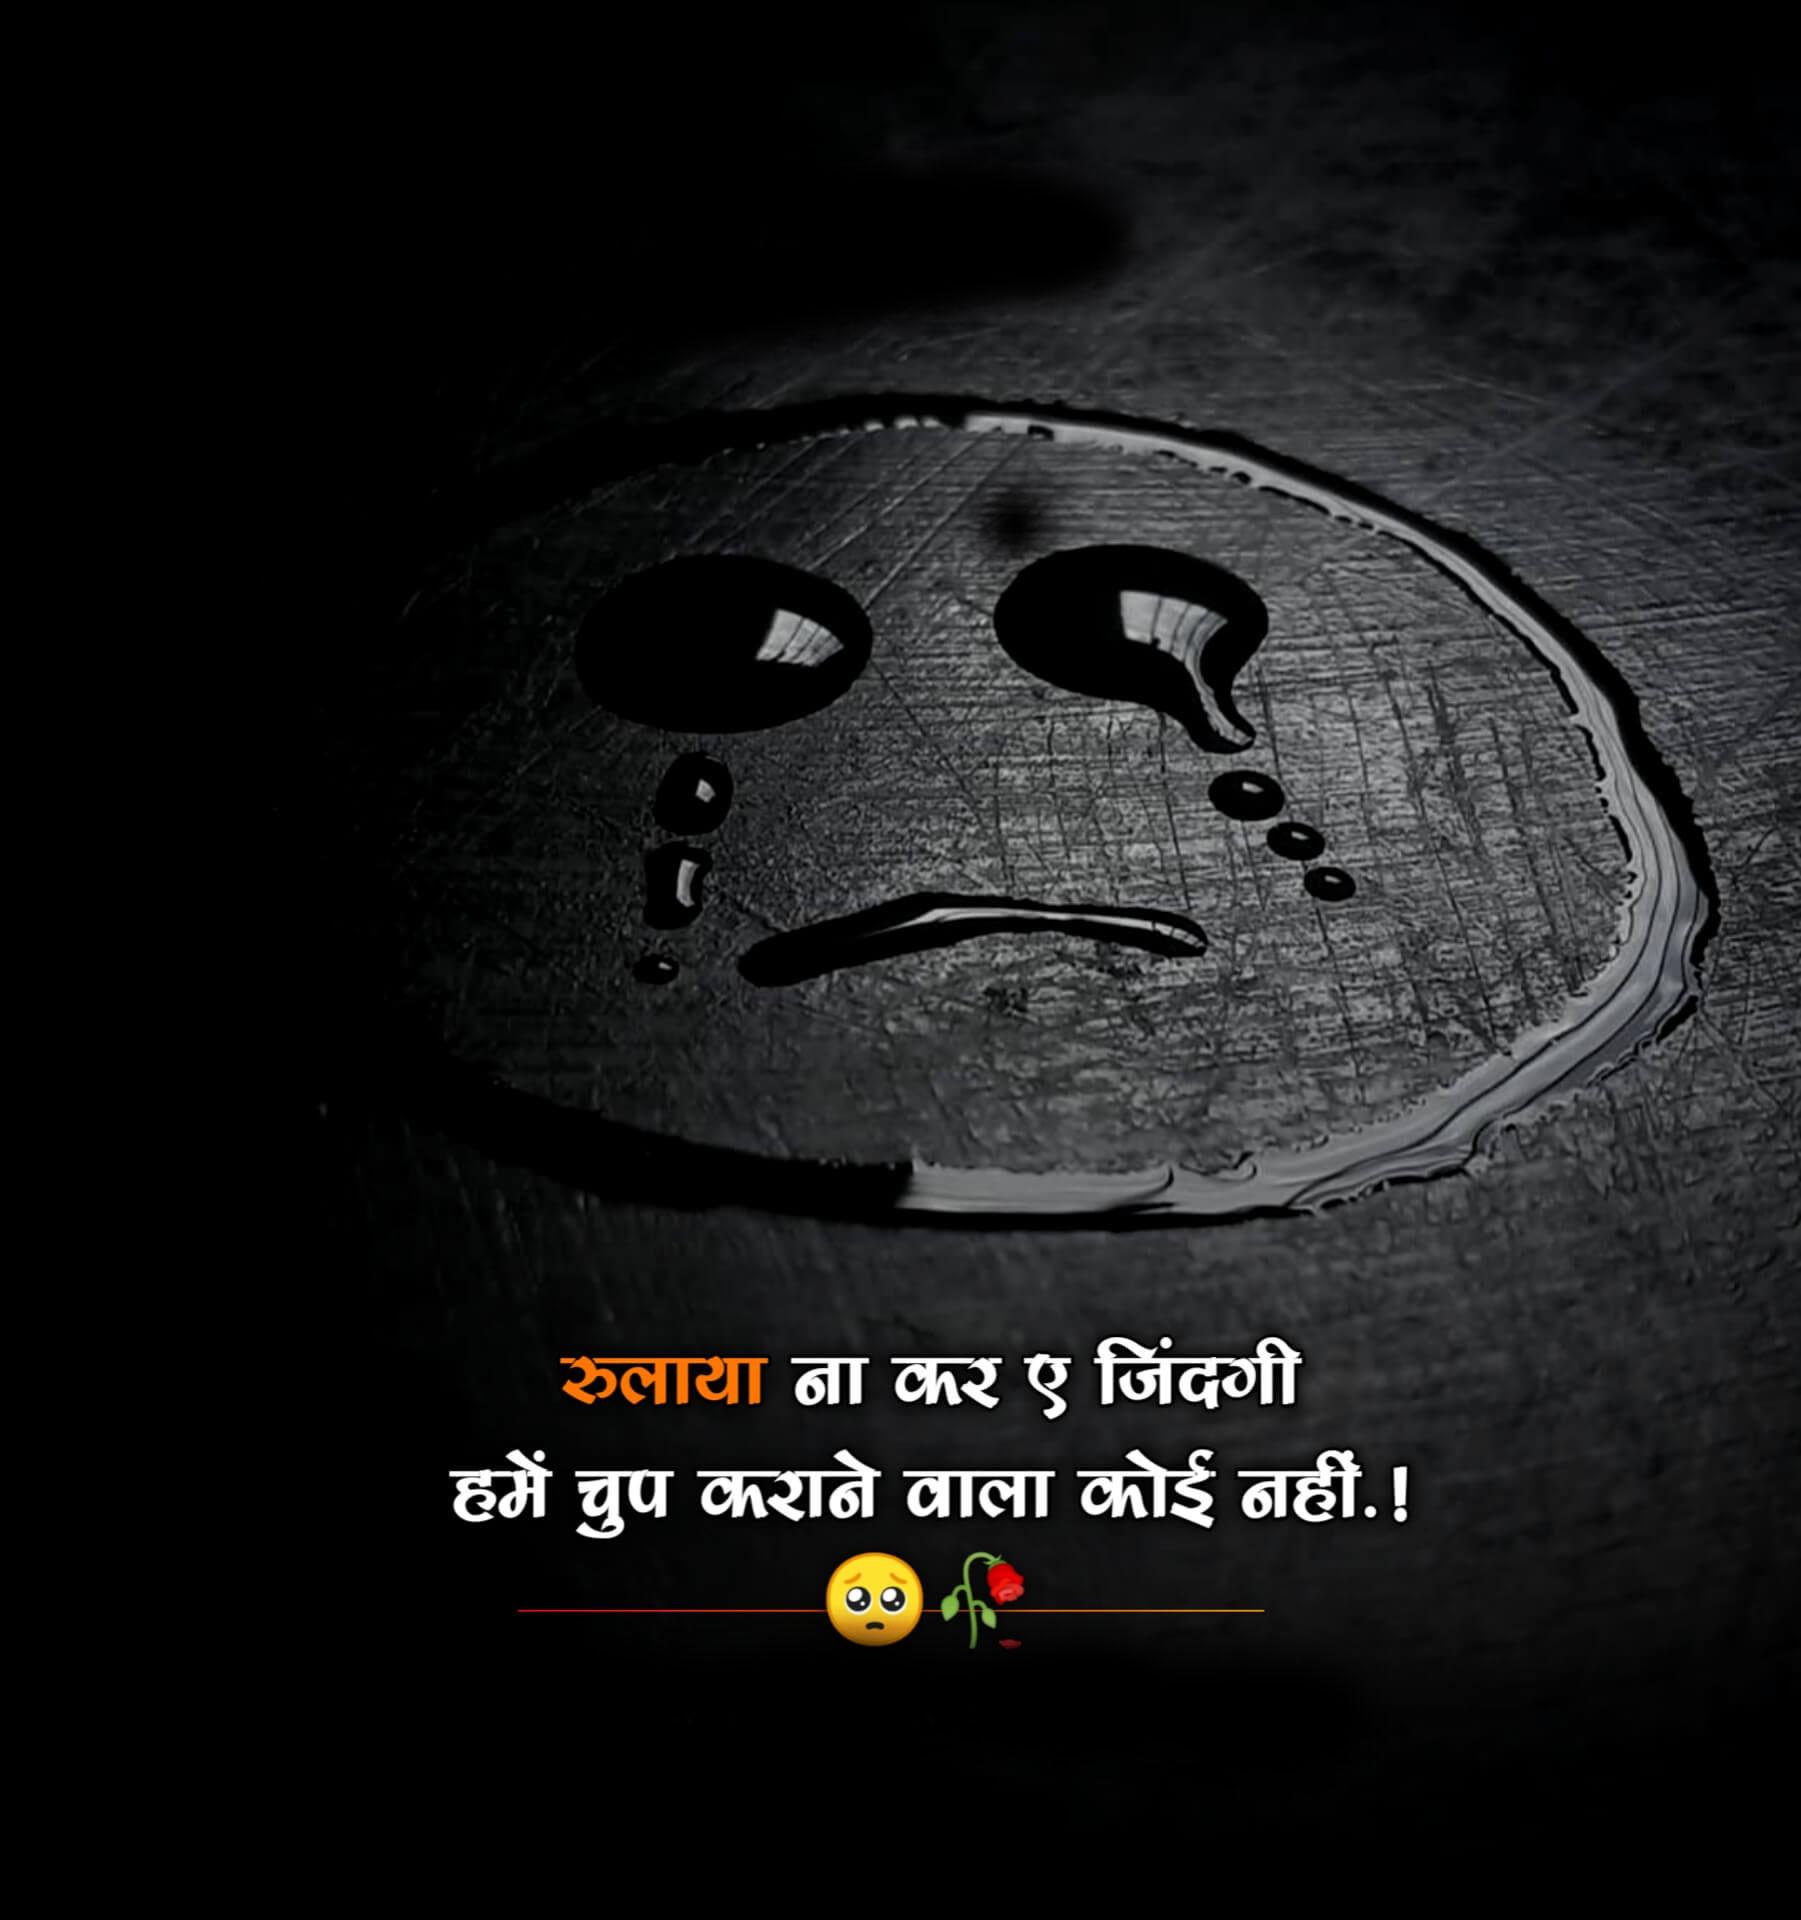 Sad Boy Shayari Images pics pictures